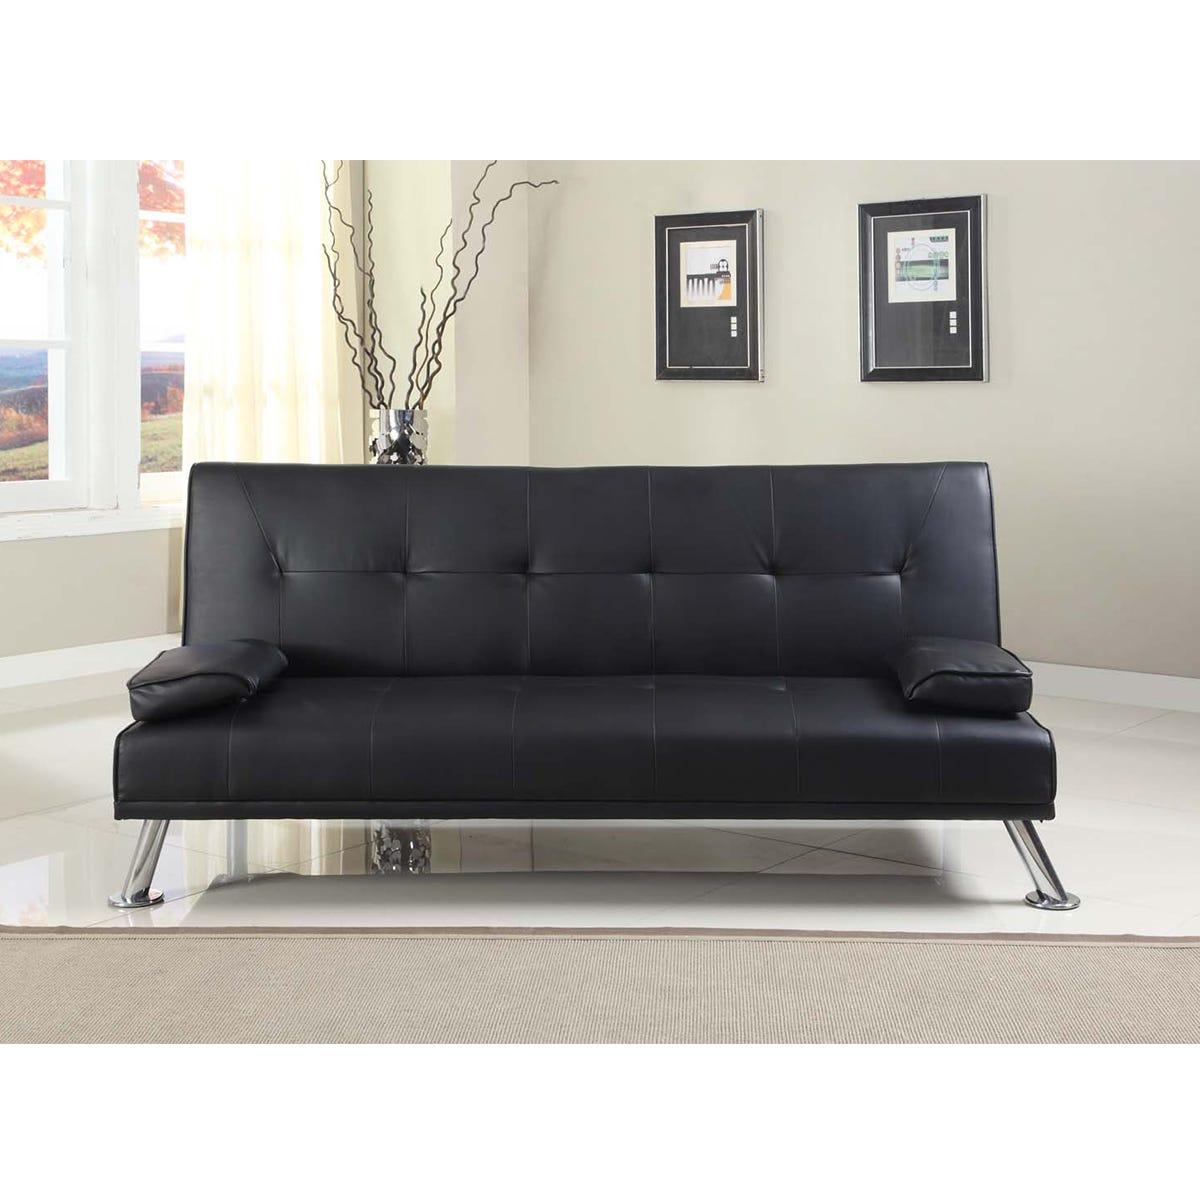 Cairns Sofa Bed - Black